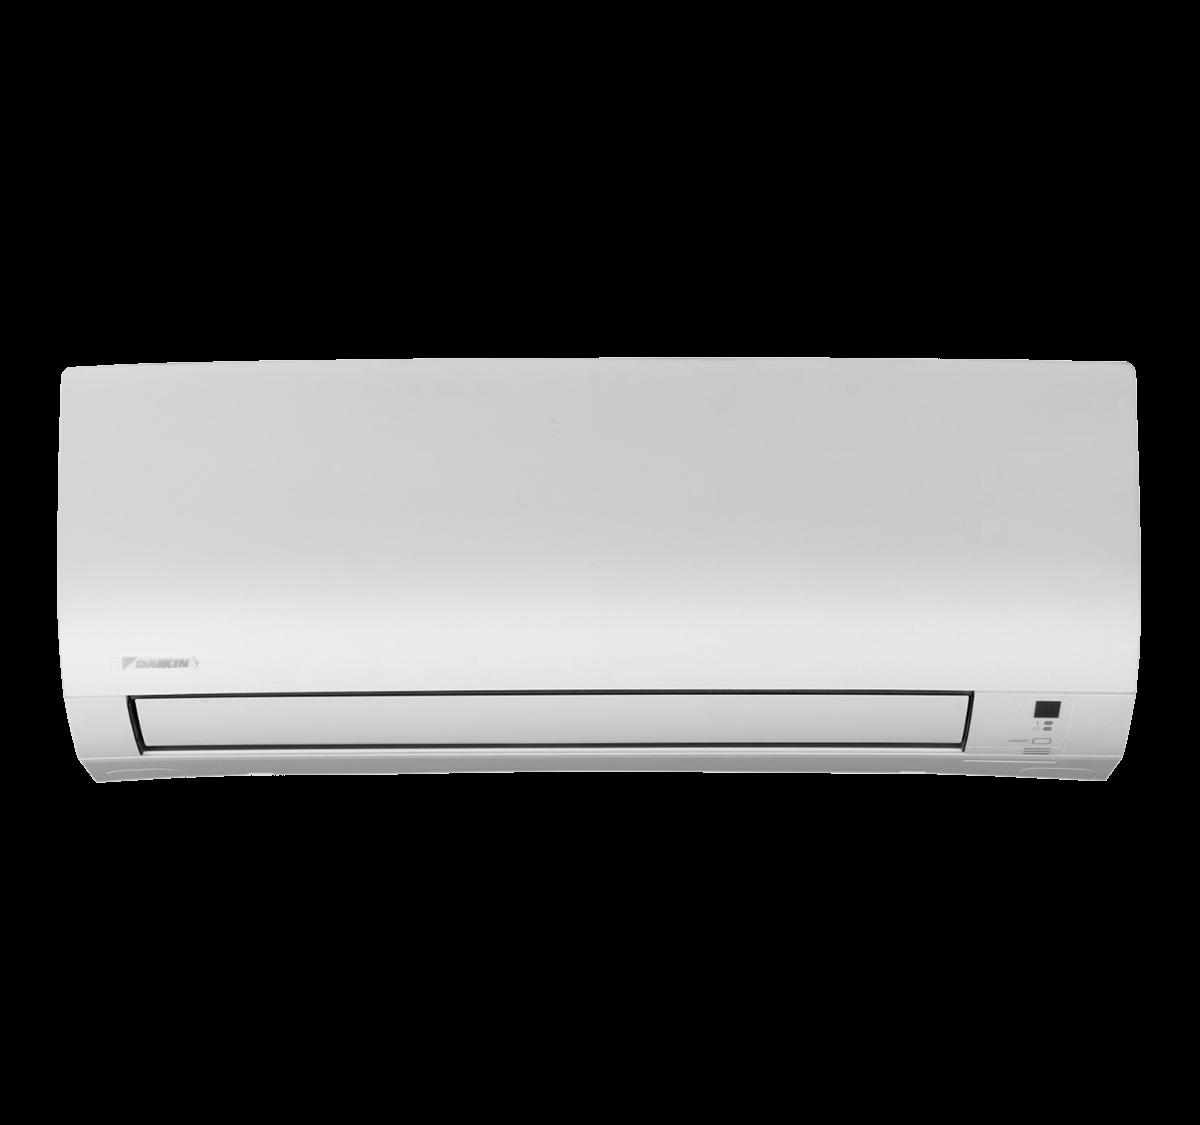 aire acondicionado unidad exterior daikin inverter bluevolution rxp35m modelo comfora txp50m instalacion incluida caseragua 01